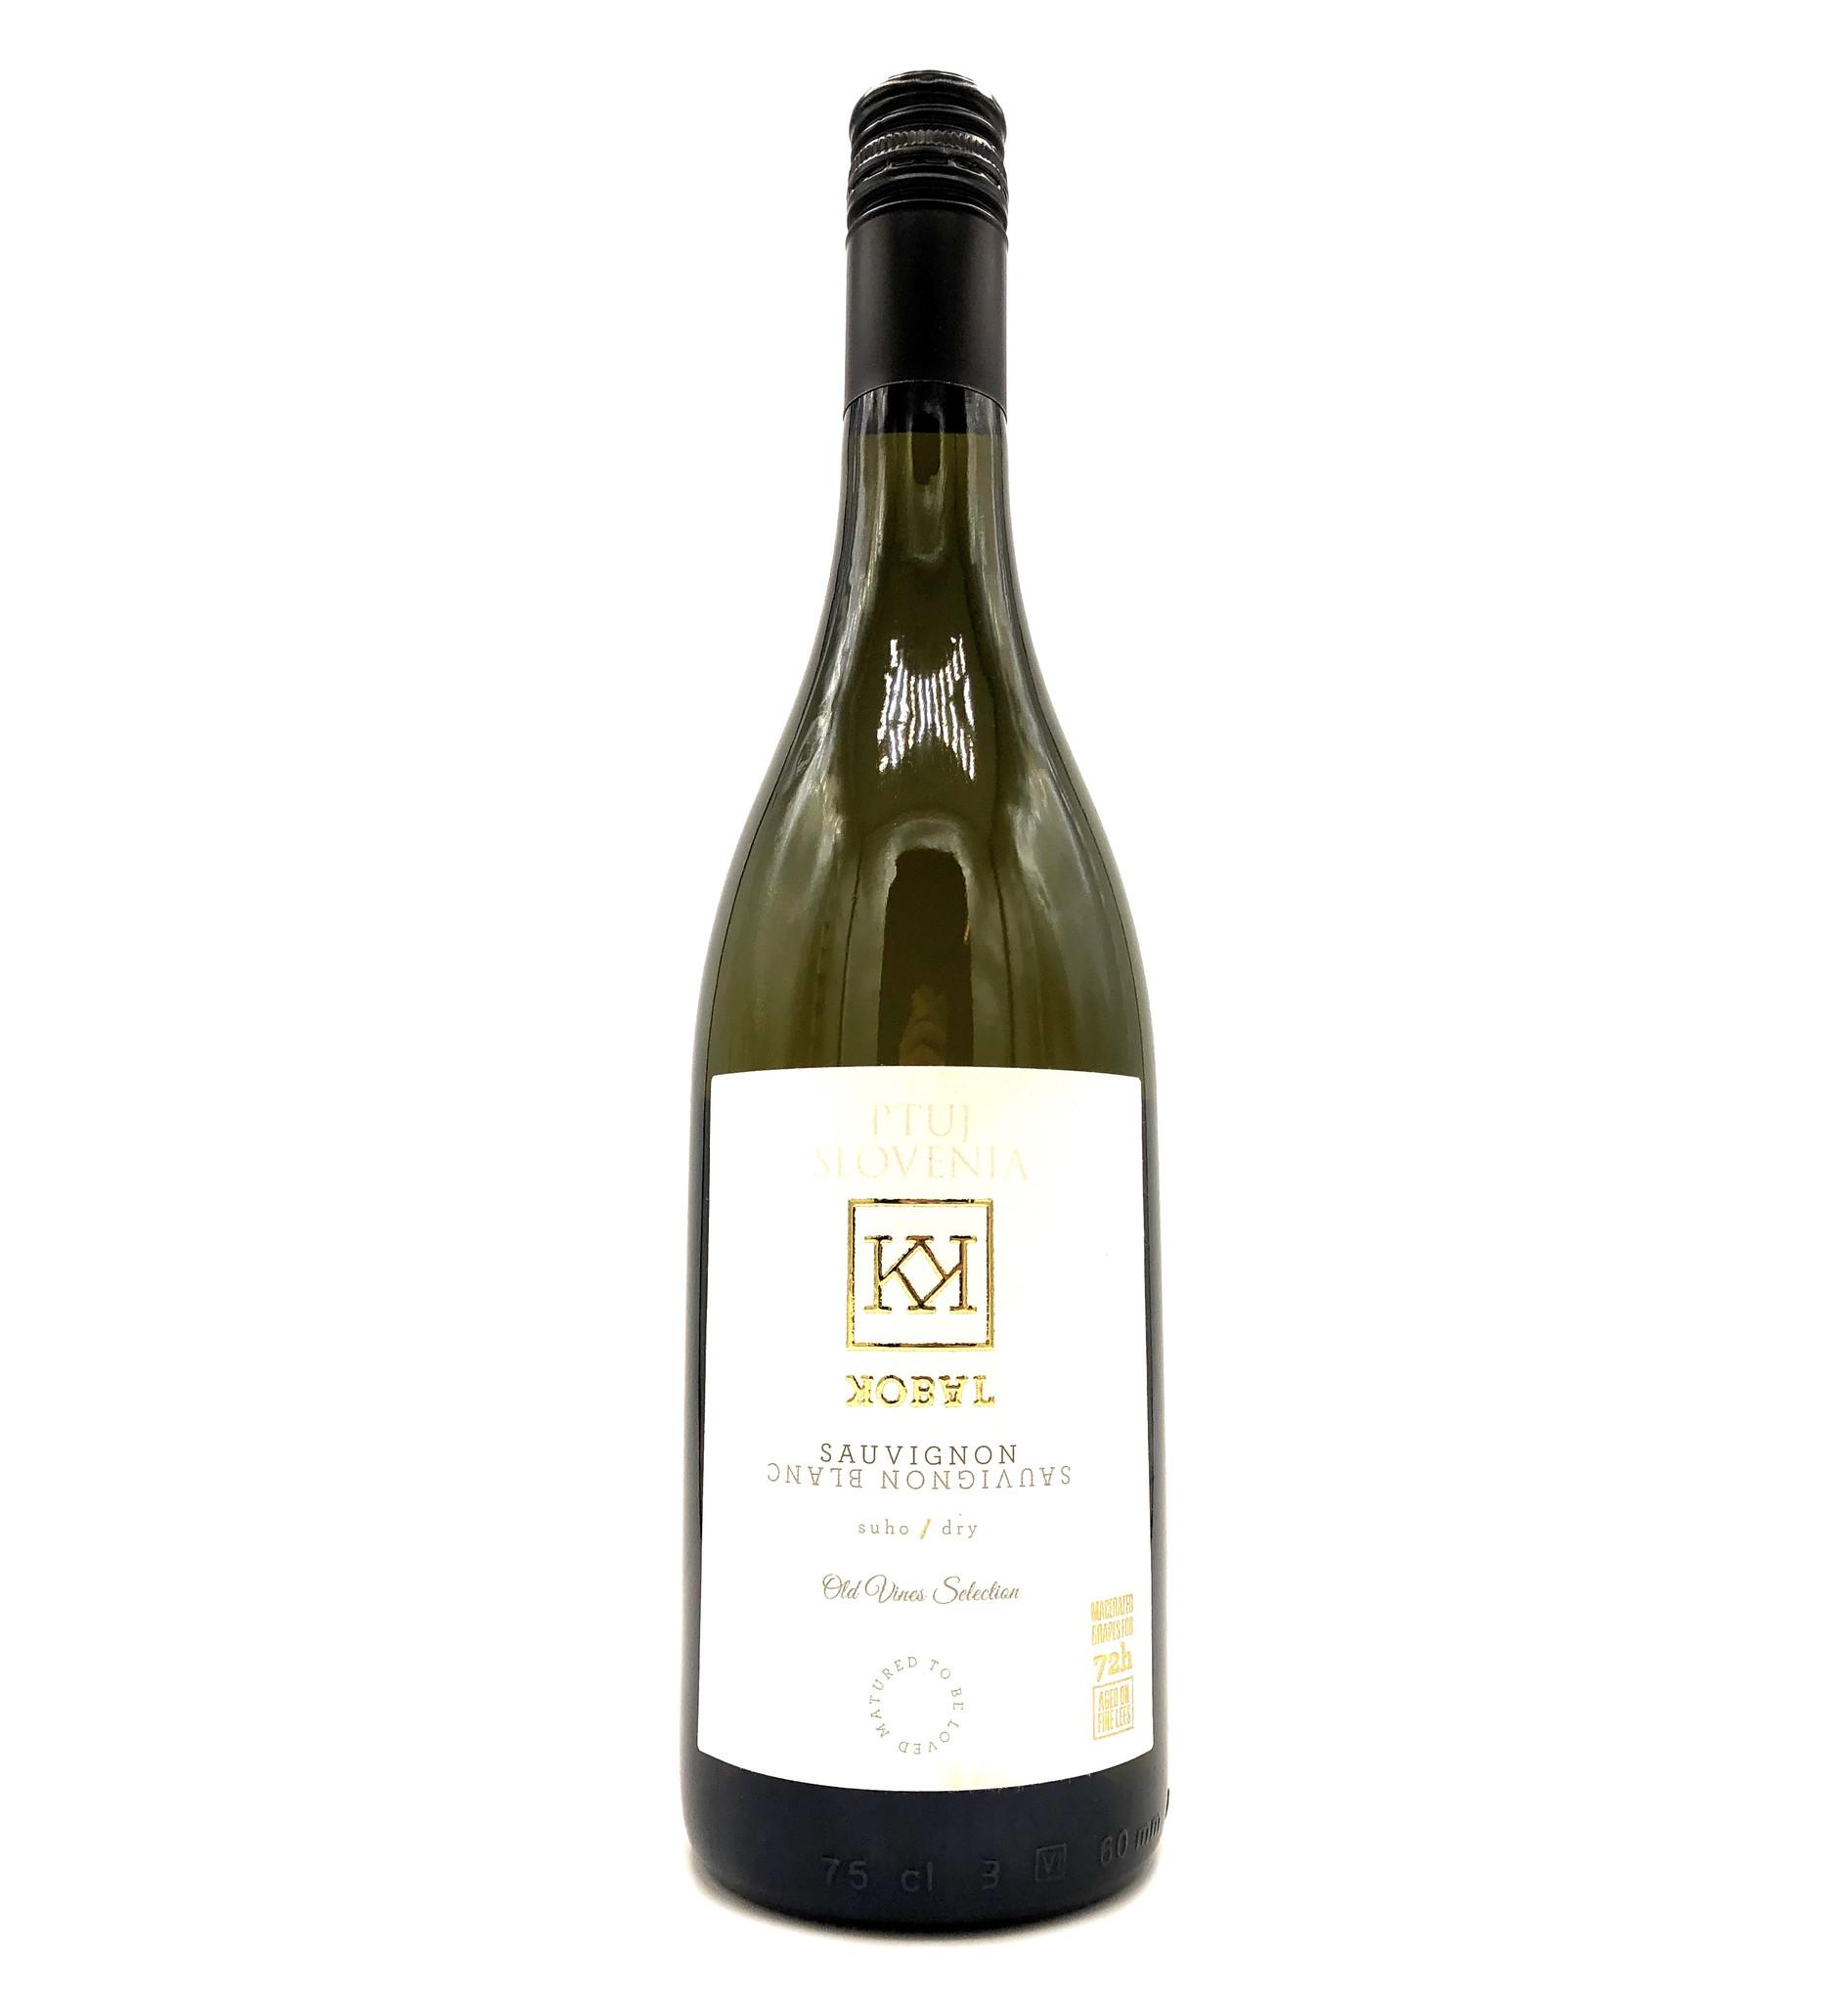 Sauvignon Blanc 2019 Kobal